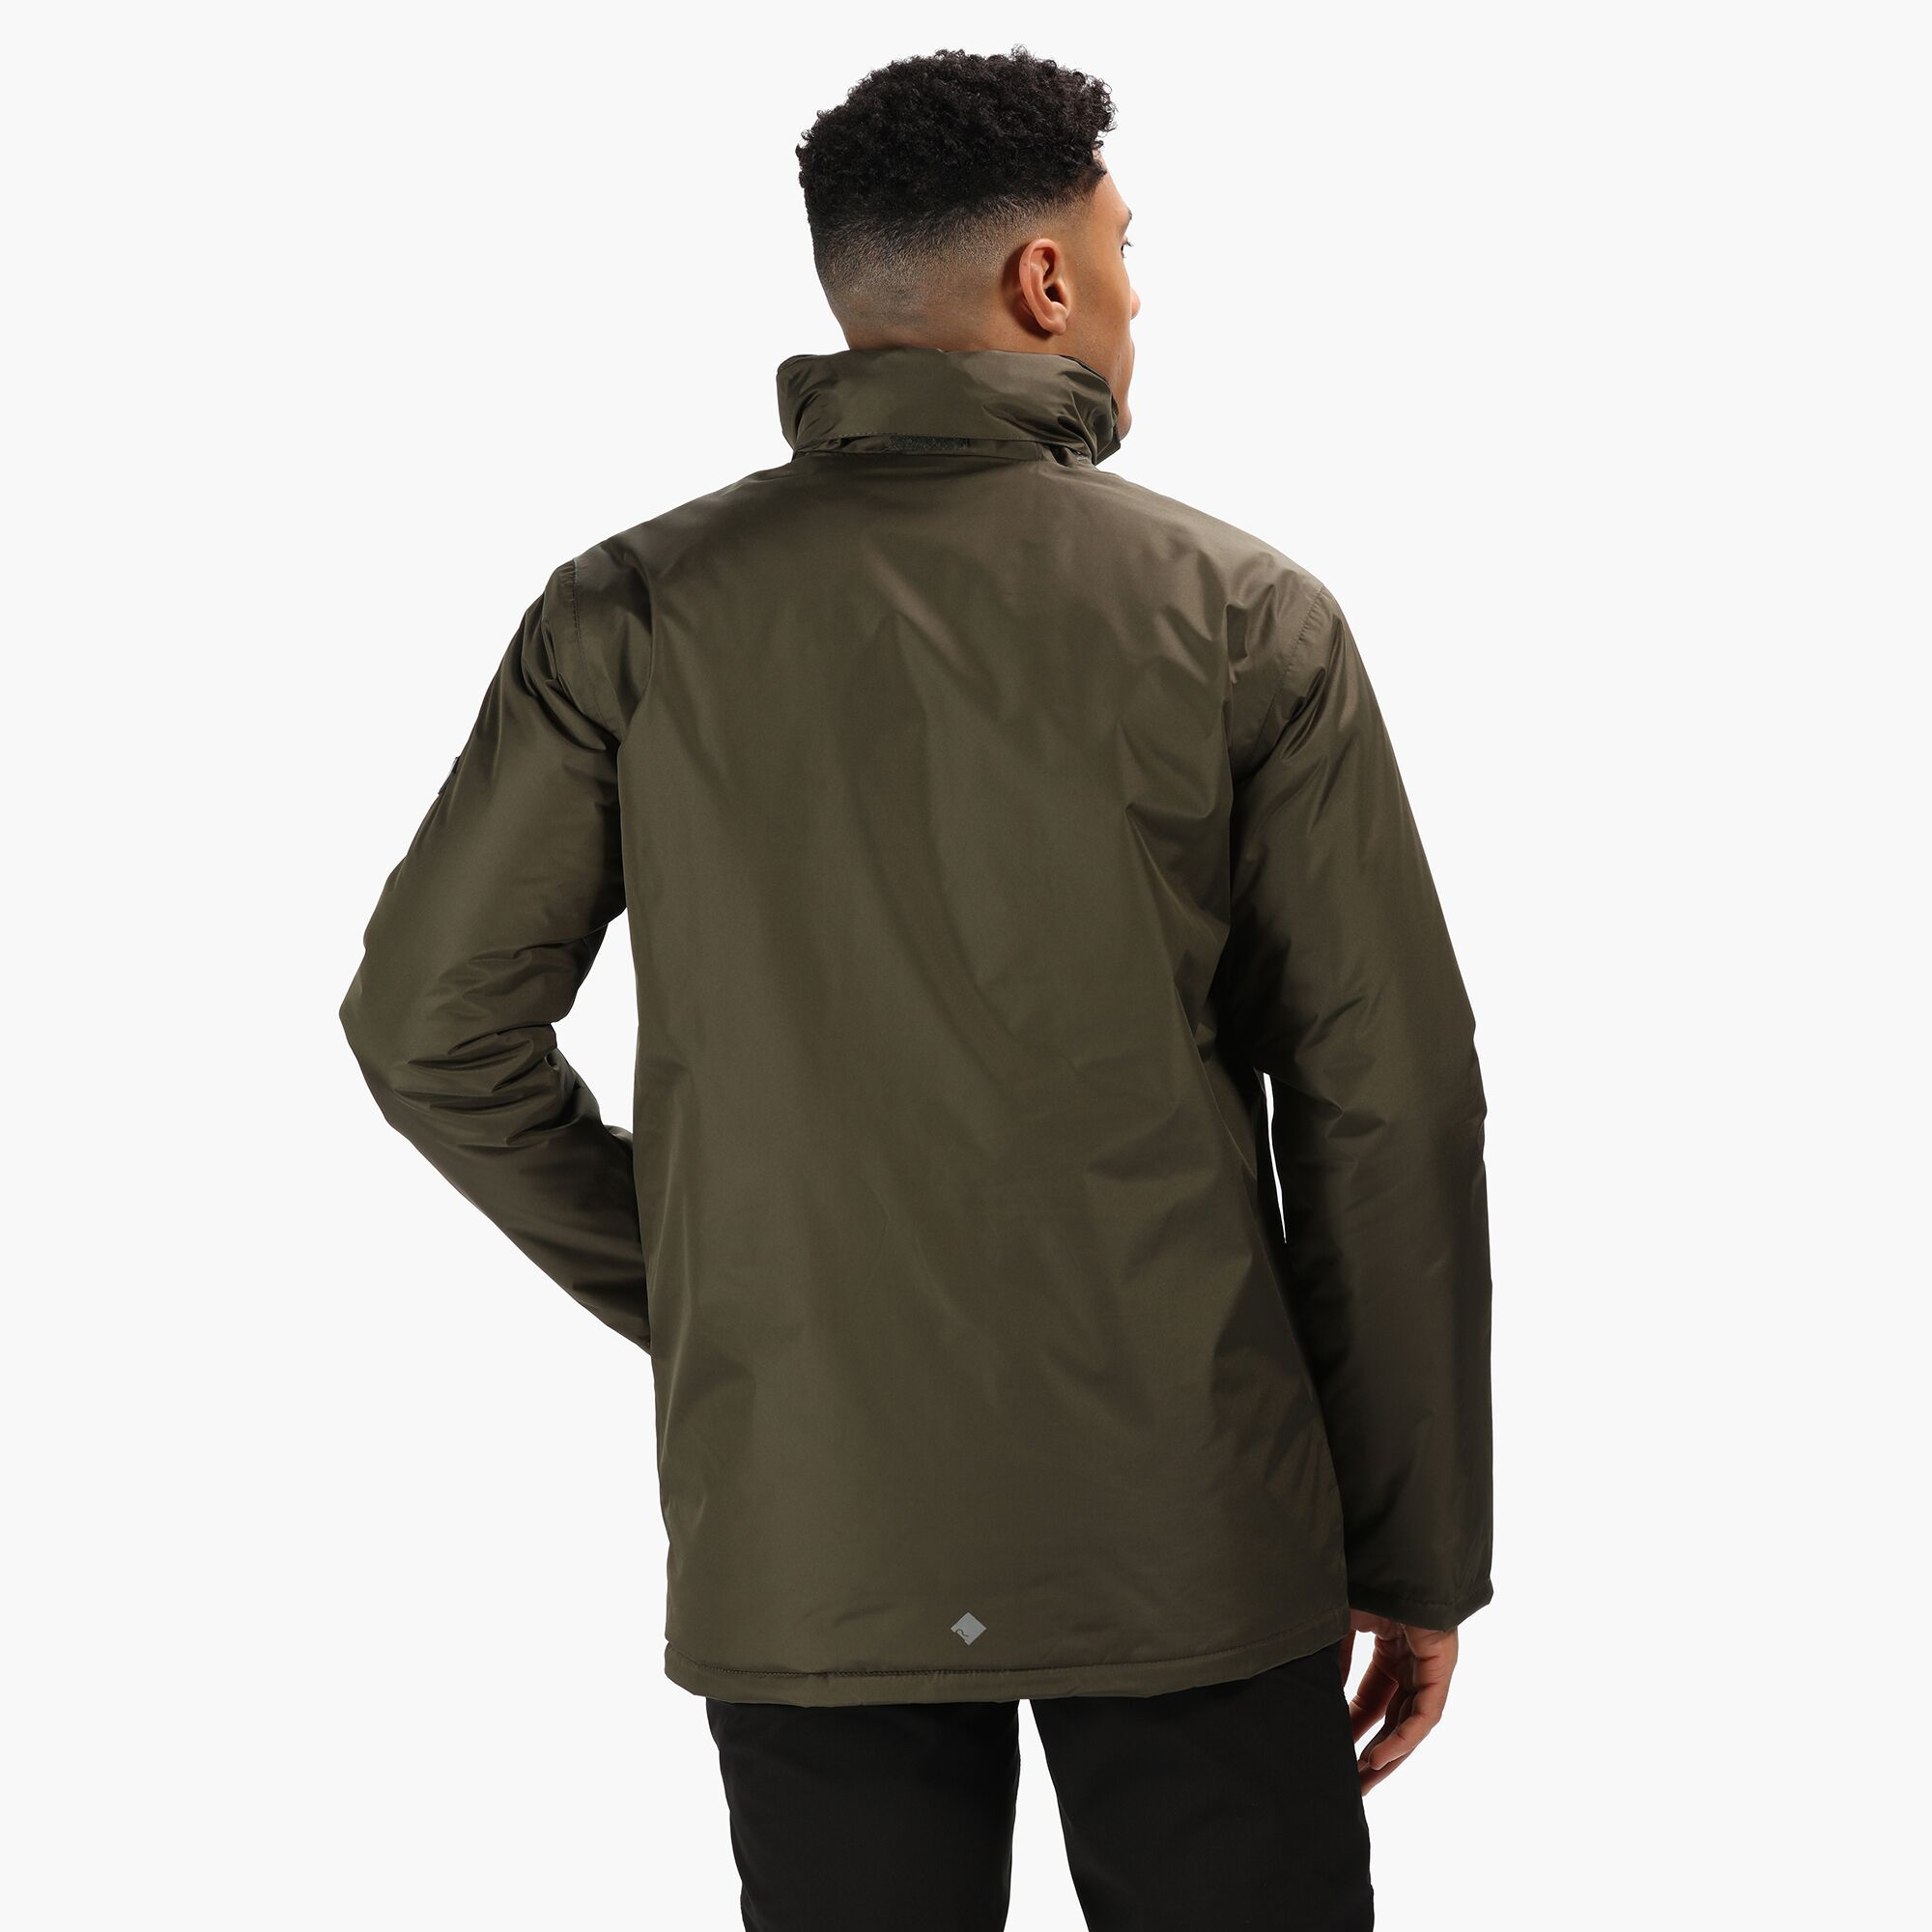 Regatta-Thornridge-Men-039-s-Waterproof-Insulated-Jacket-RRP-70 thumbnail 5